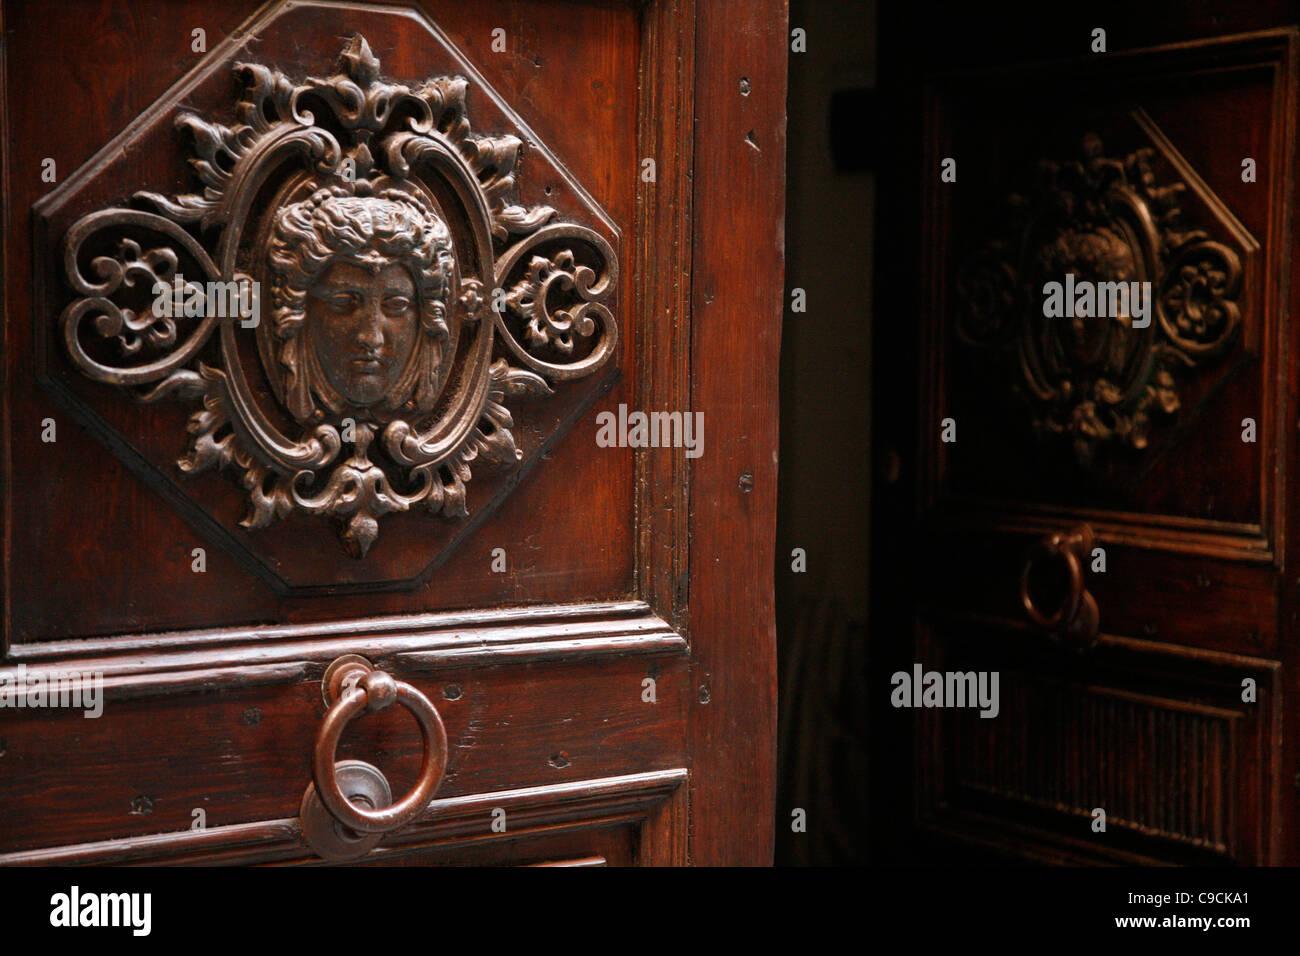 Detalle de la puerta, Castello, Cagliari, Cerdeña, Italia. Imagen De Stock